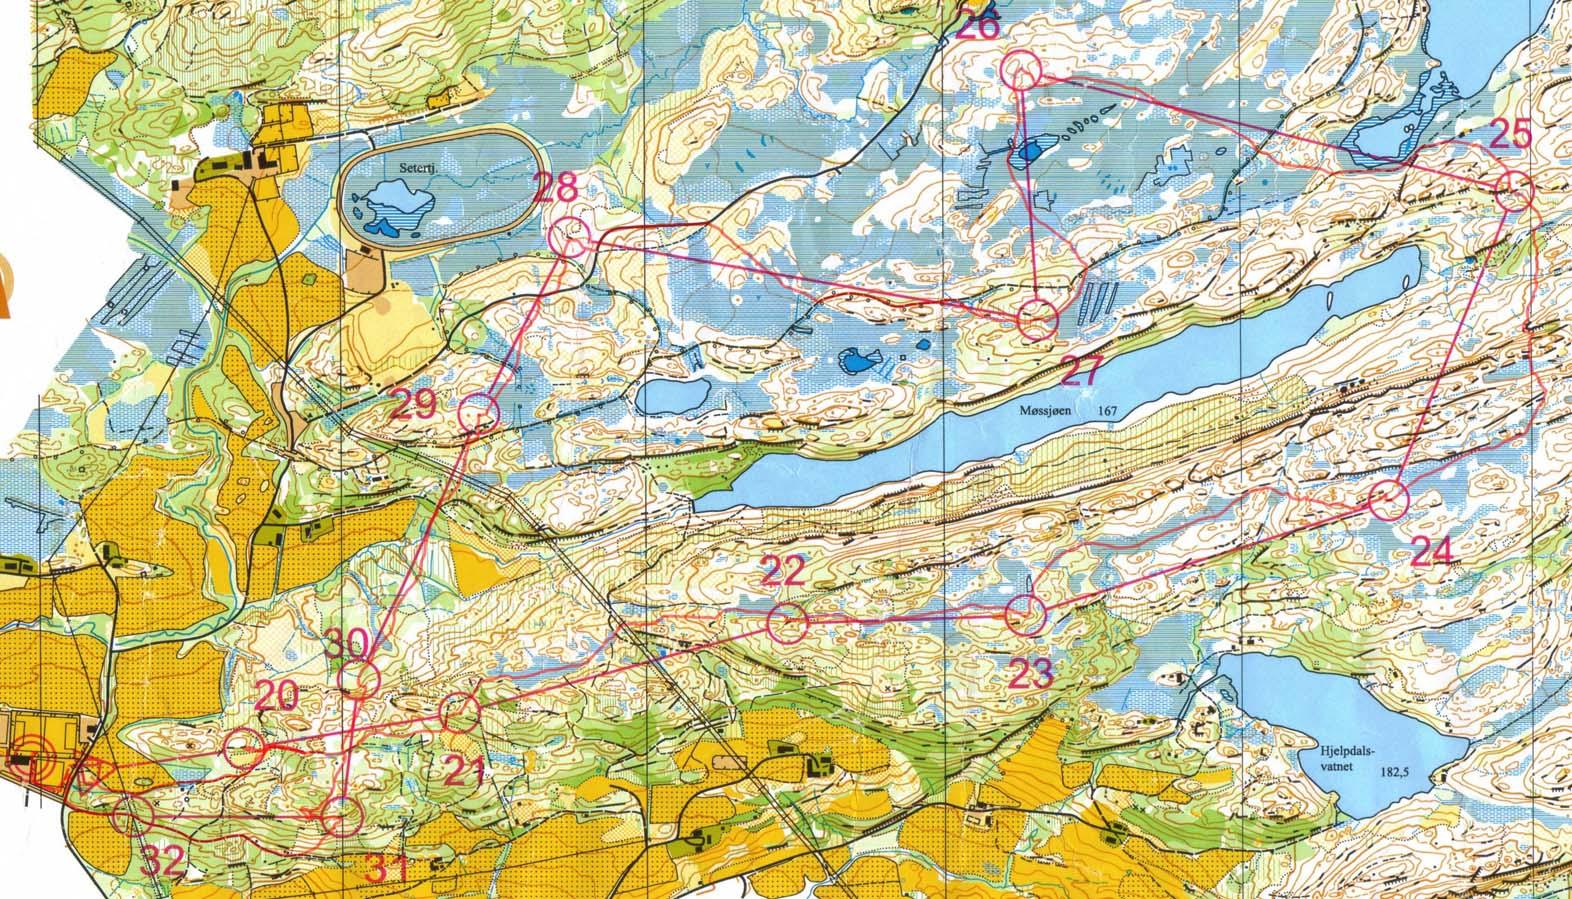 Stjordal Norway  City pictures : ... autumn 2009 / 2009.11.01 Bjornarlopet 2 Remarka Stjordal Norway